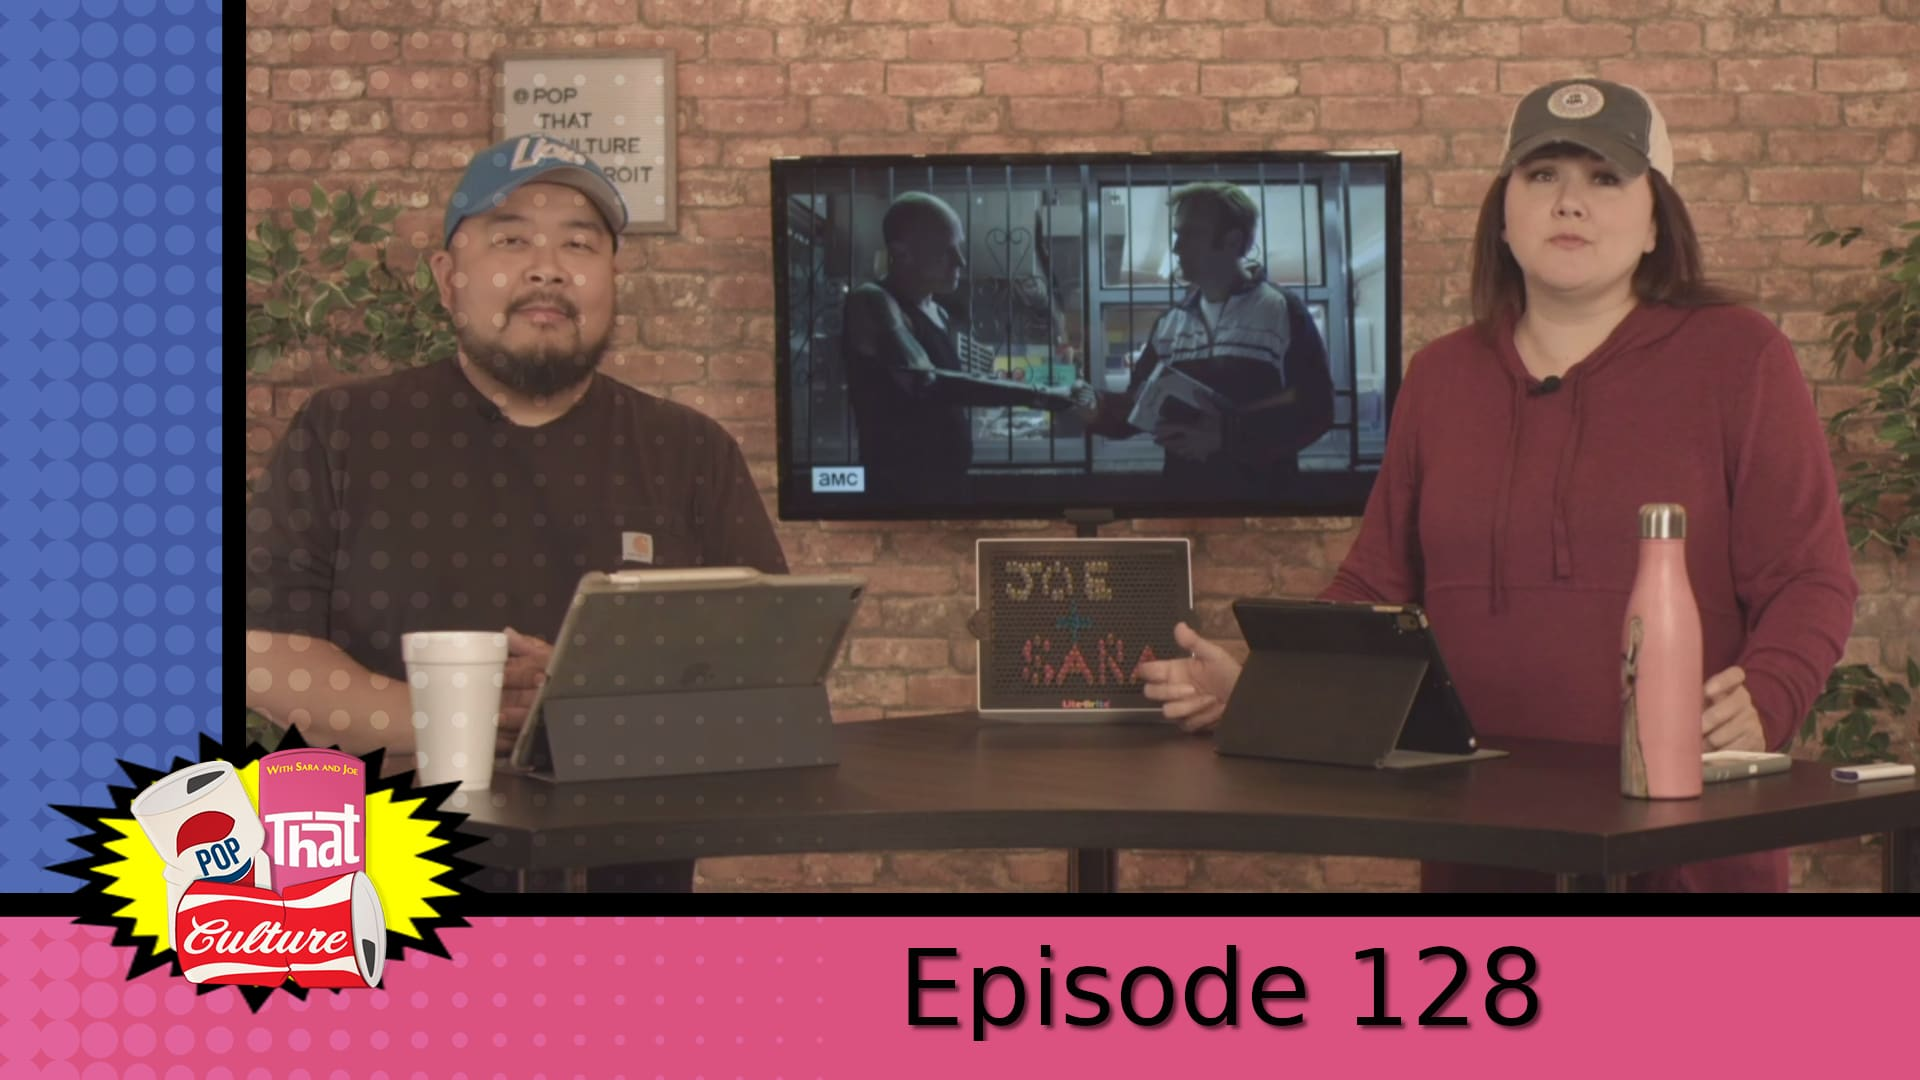 Pop That Culture - Episode 128